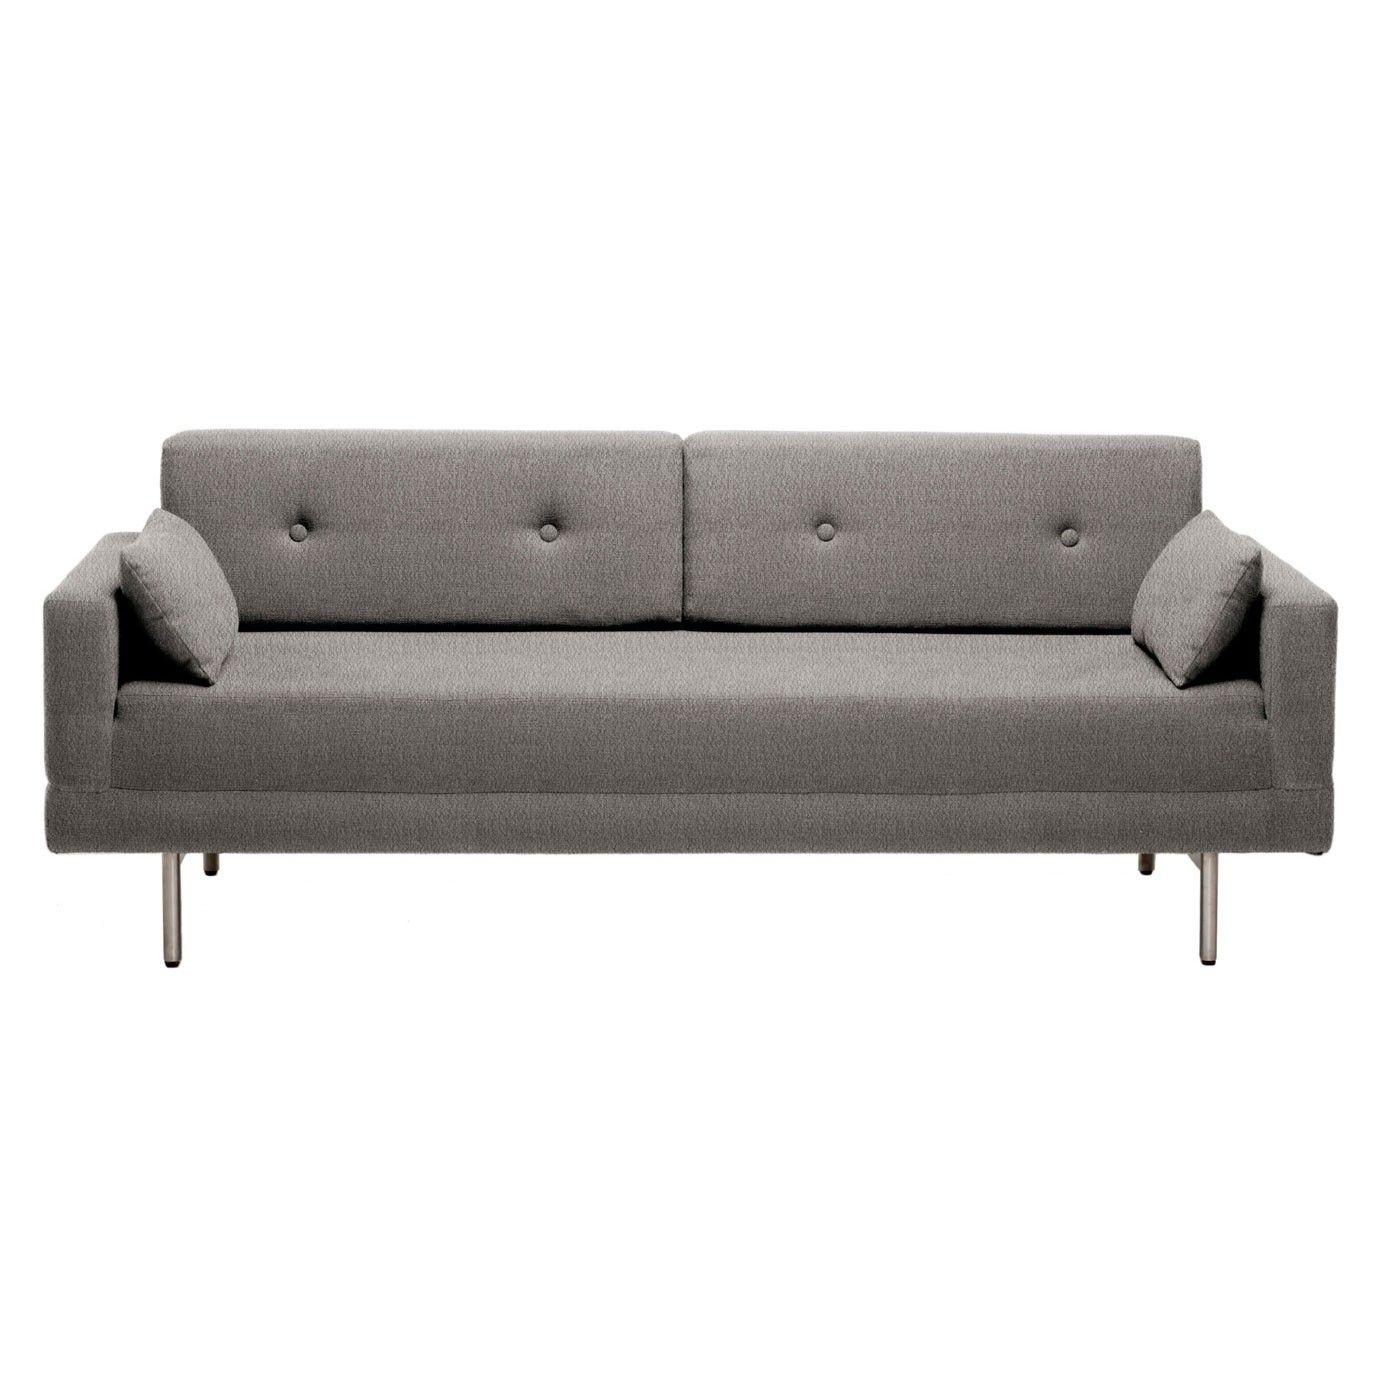 One Night Stand 80 Modern Sleeper Sofa Queen Size Sleeper Sofa Sleeper Sofa